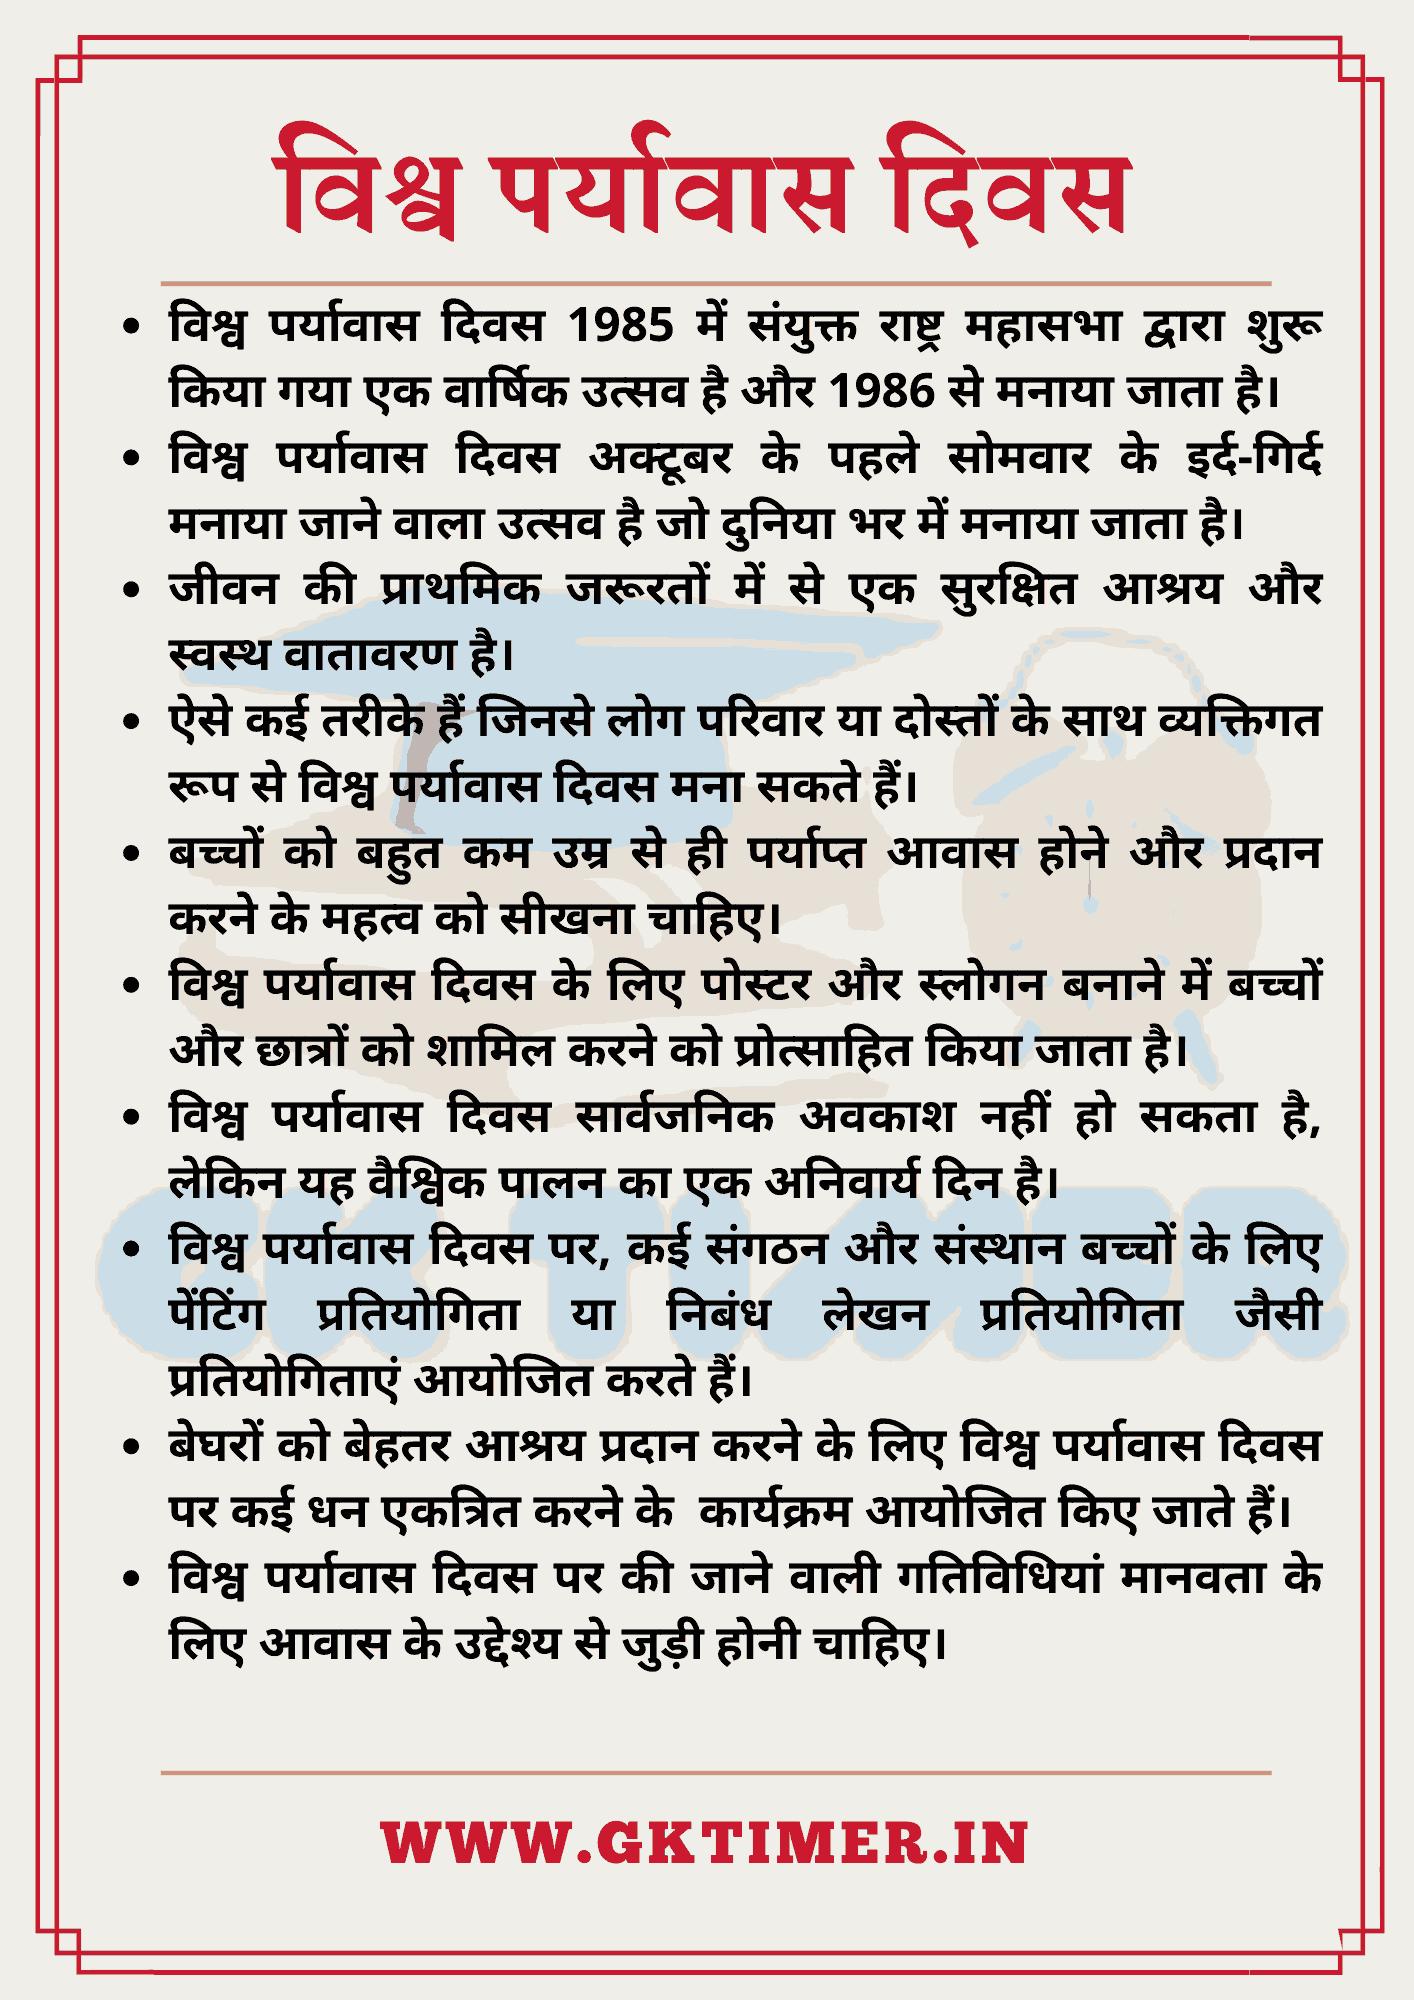 विश्व पर्यावास दिवस पर निबंध   Essay on World Habitat Day in Hindi   10 Lines on World Habitat Day in Hindi